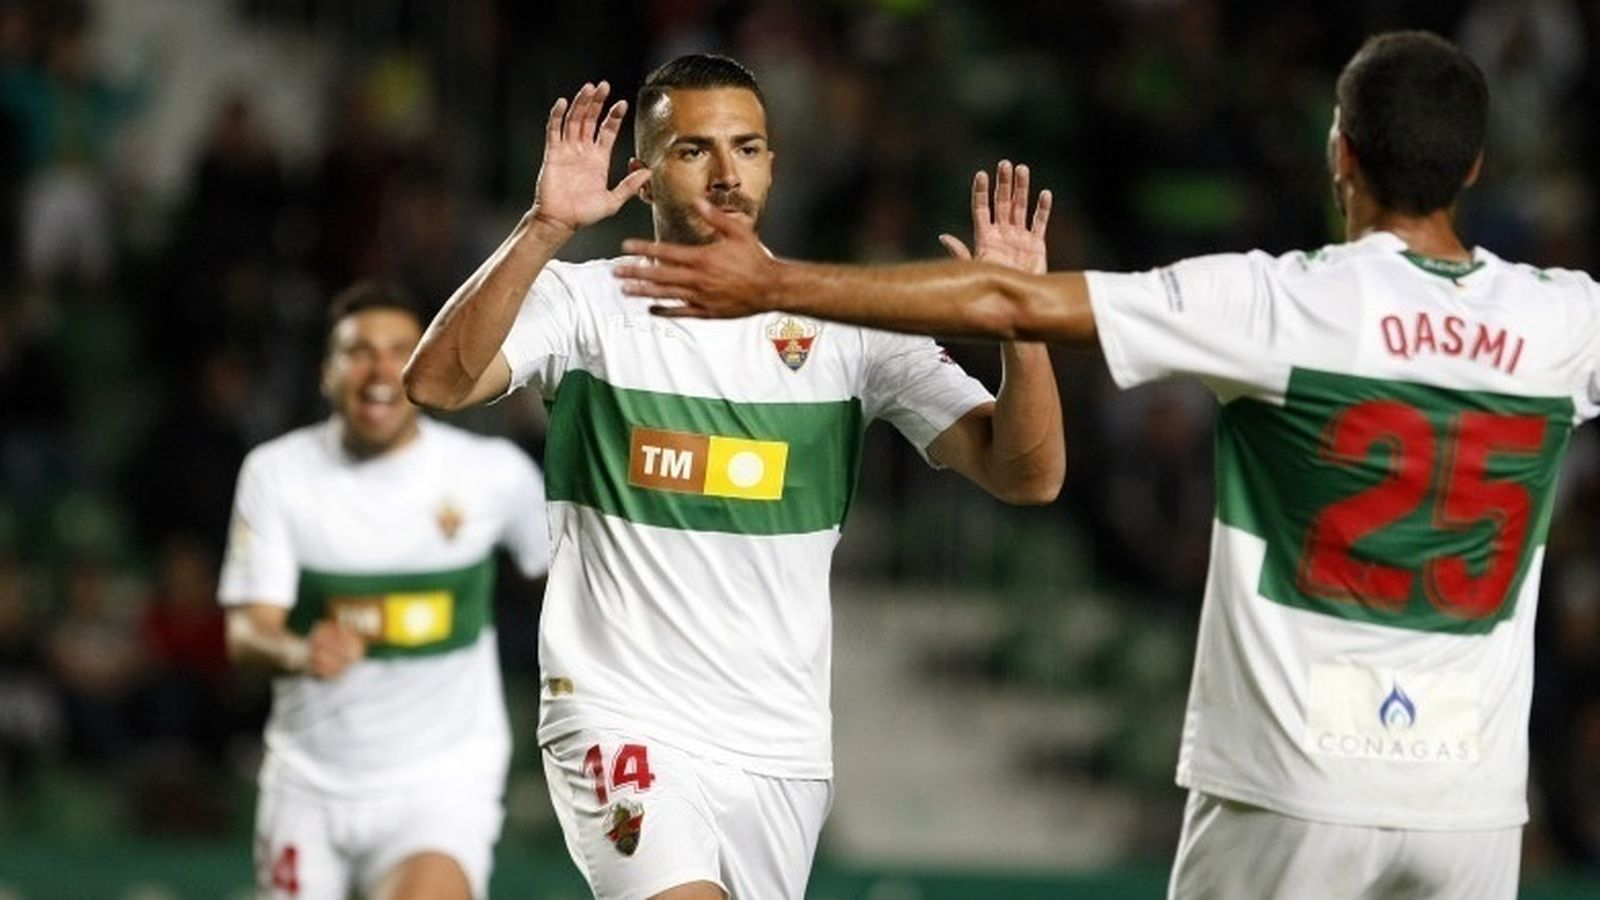 Foto: Jugadores del Elche celebran un gol. (Europa Press)